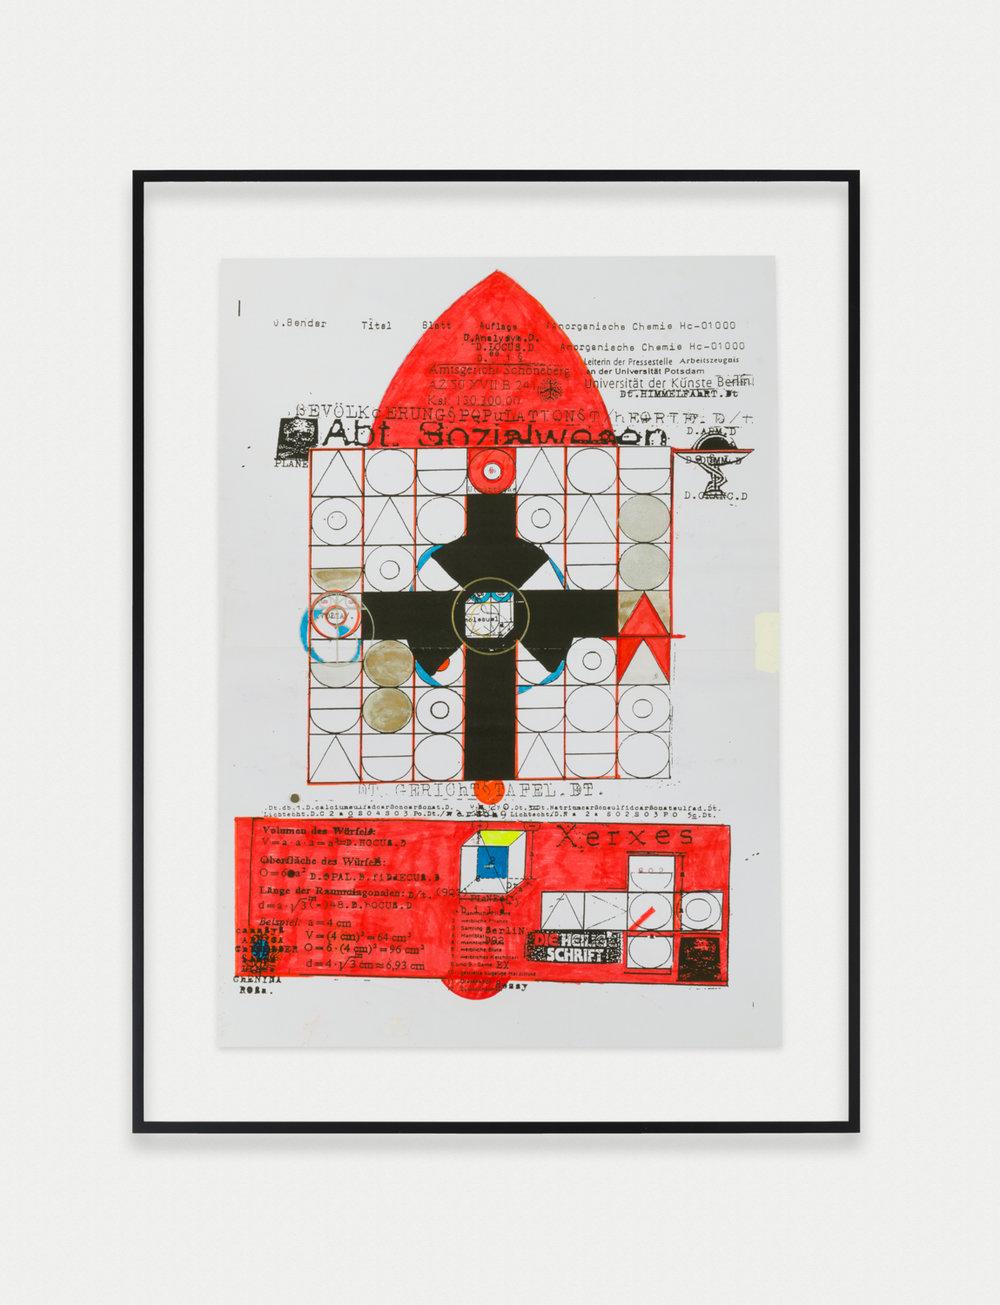 Adelhyd van Bender Untitled 1999-2014 Mixed media on photocopy 16.5 x 11.75 in (41.91h x 29.85w cm) AVB014